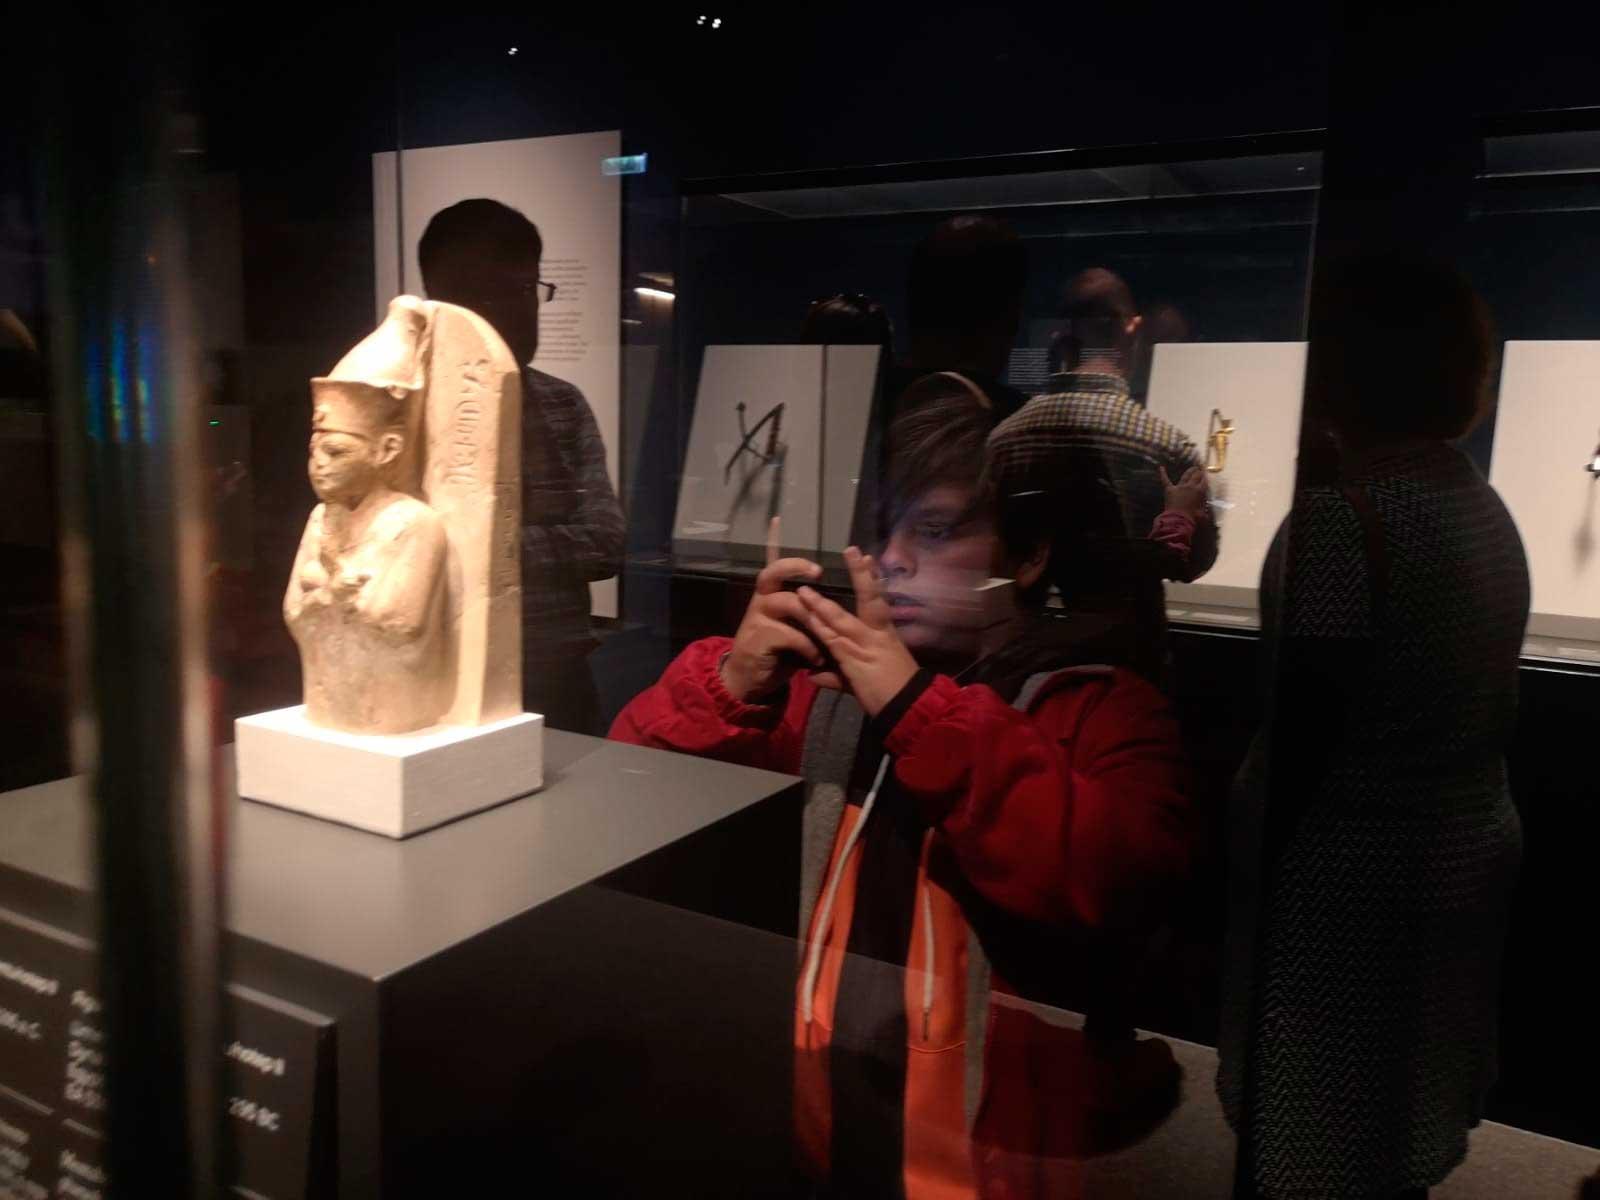 exposicion-el-faraon-egipto